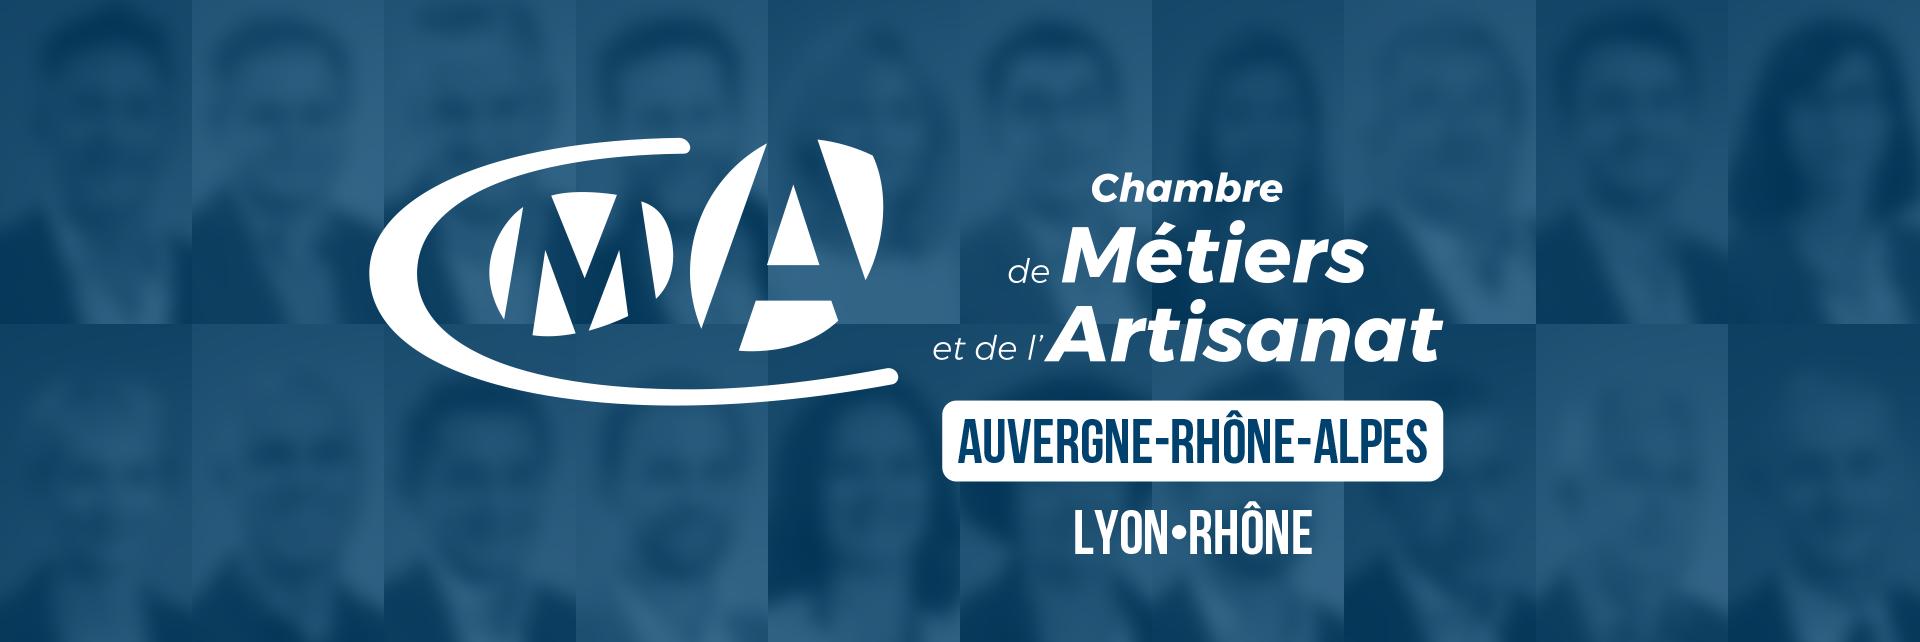 équipe de direction CMA Auvergne-Rhône-Alpes - CMA Lyon-Rhône